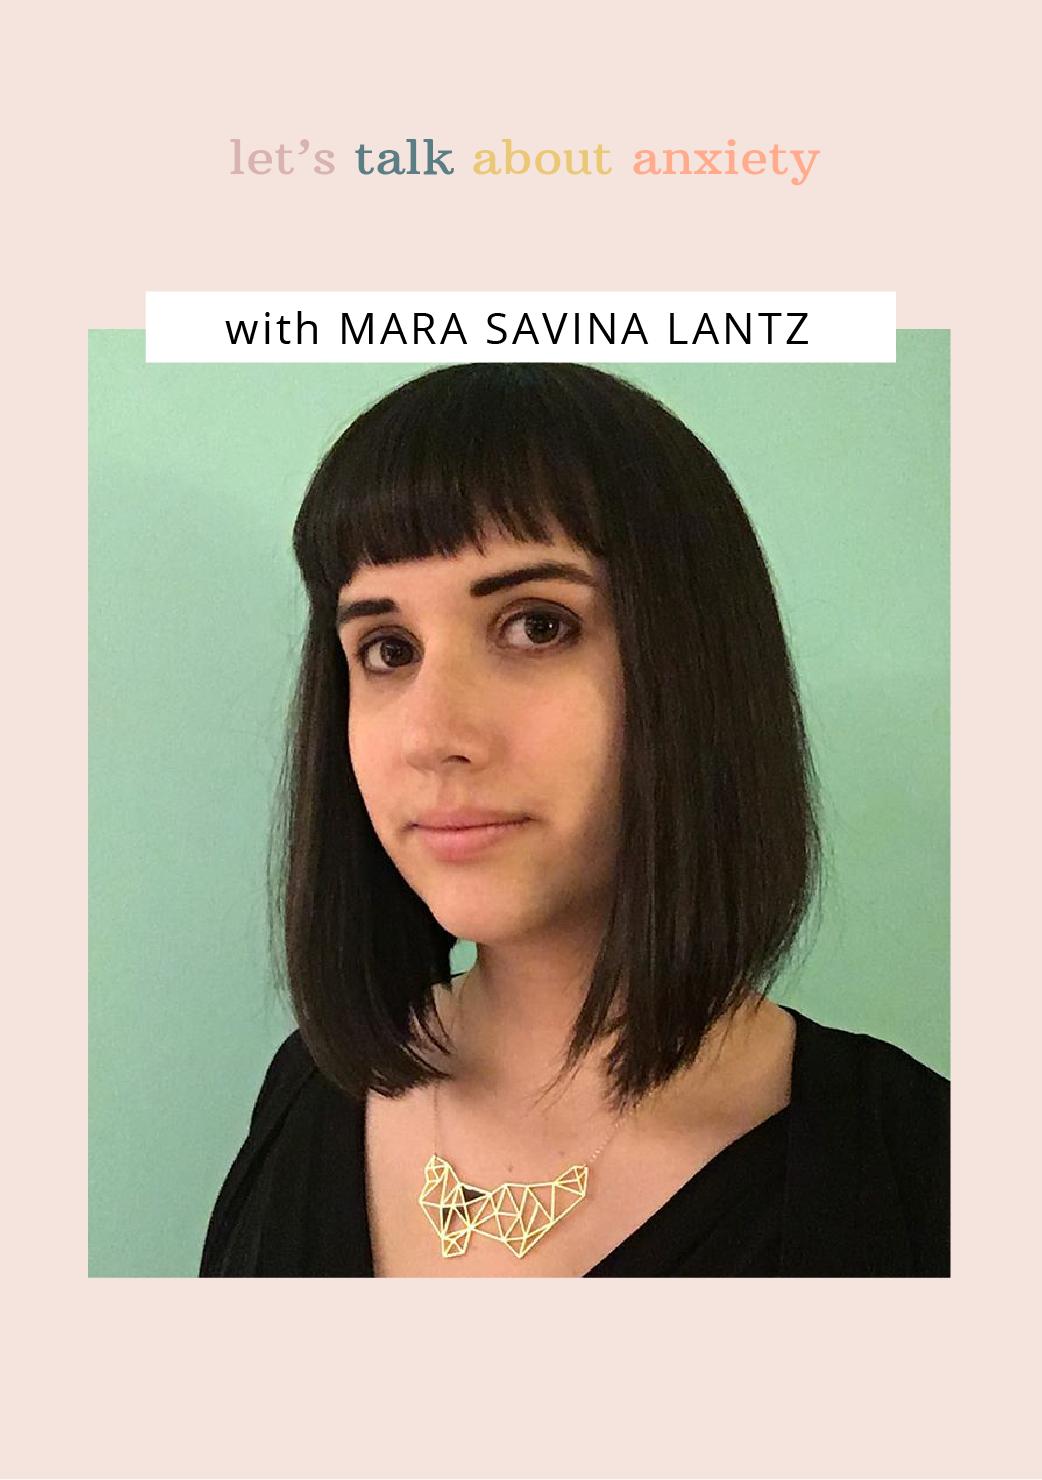 Let's Talk About Anxiety: Mara Savina Lantz Image